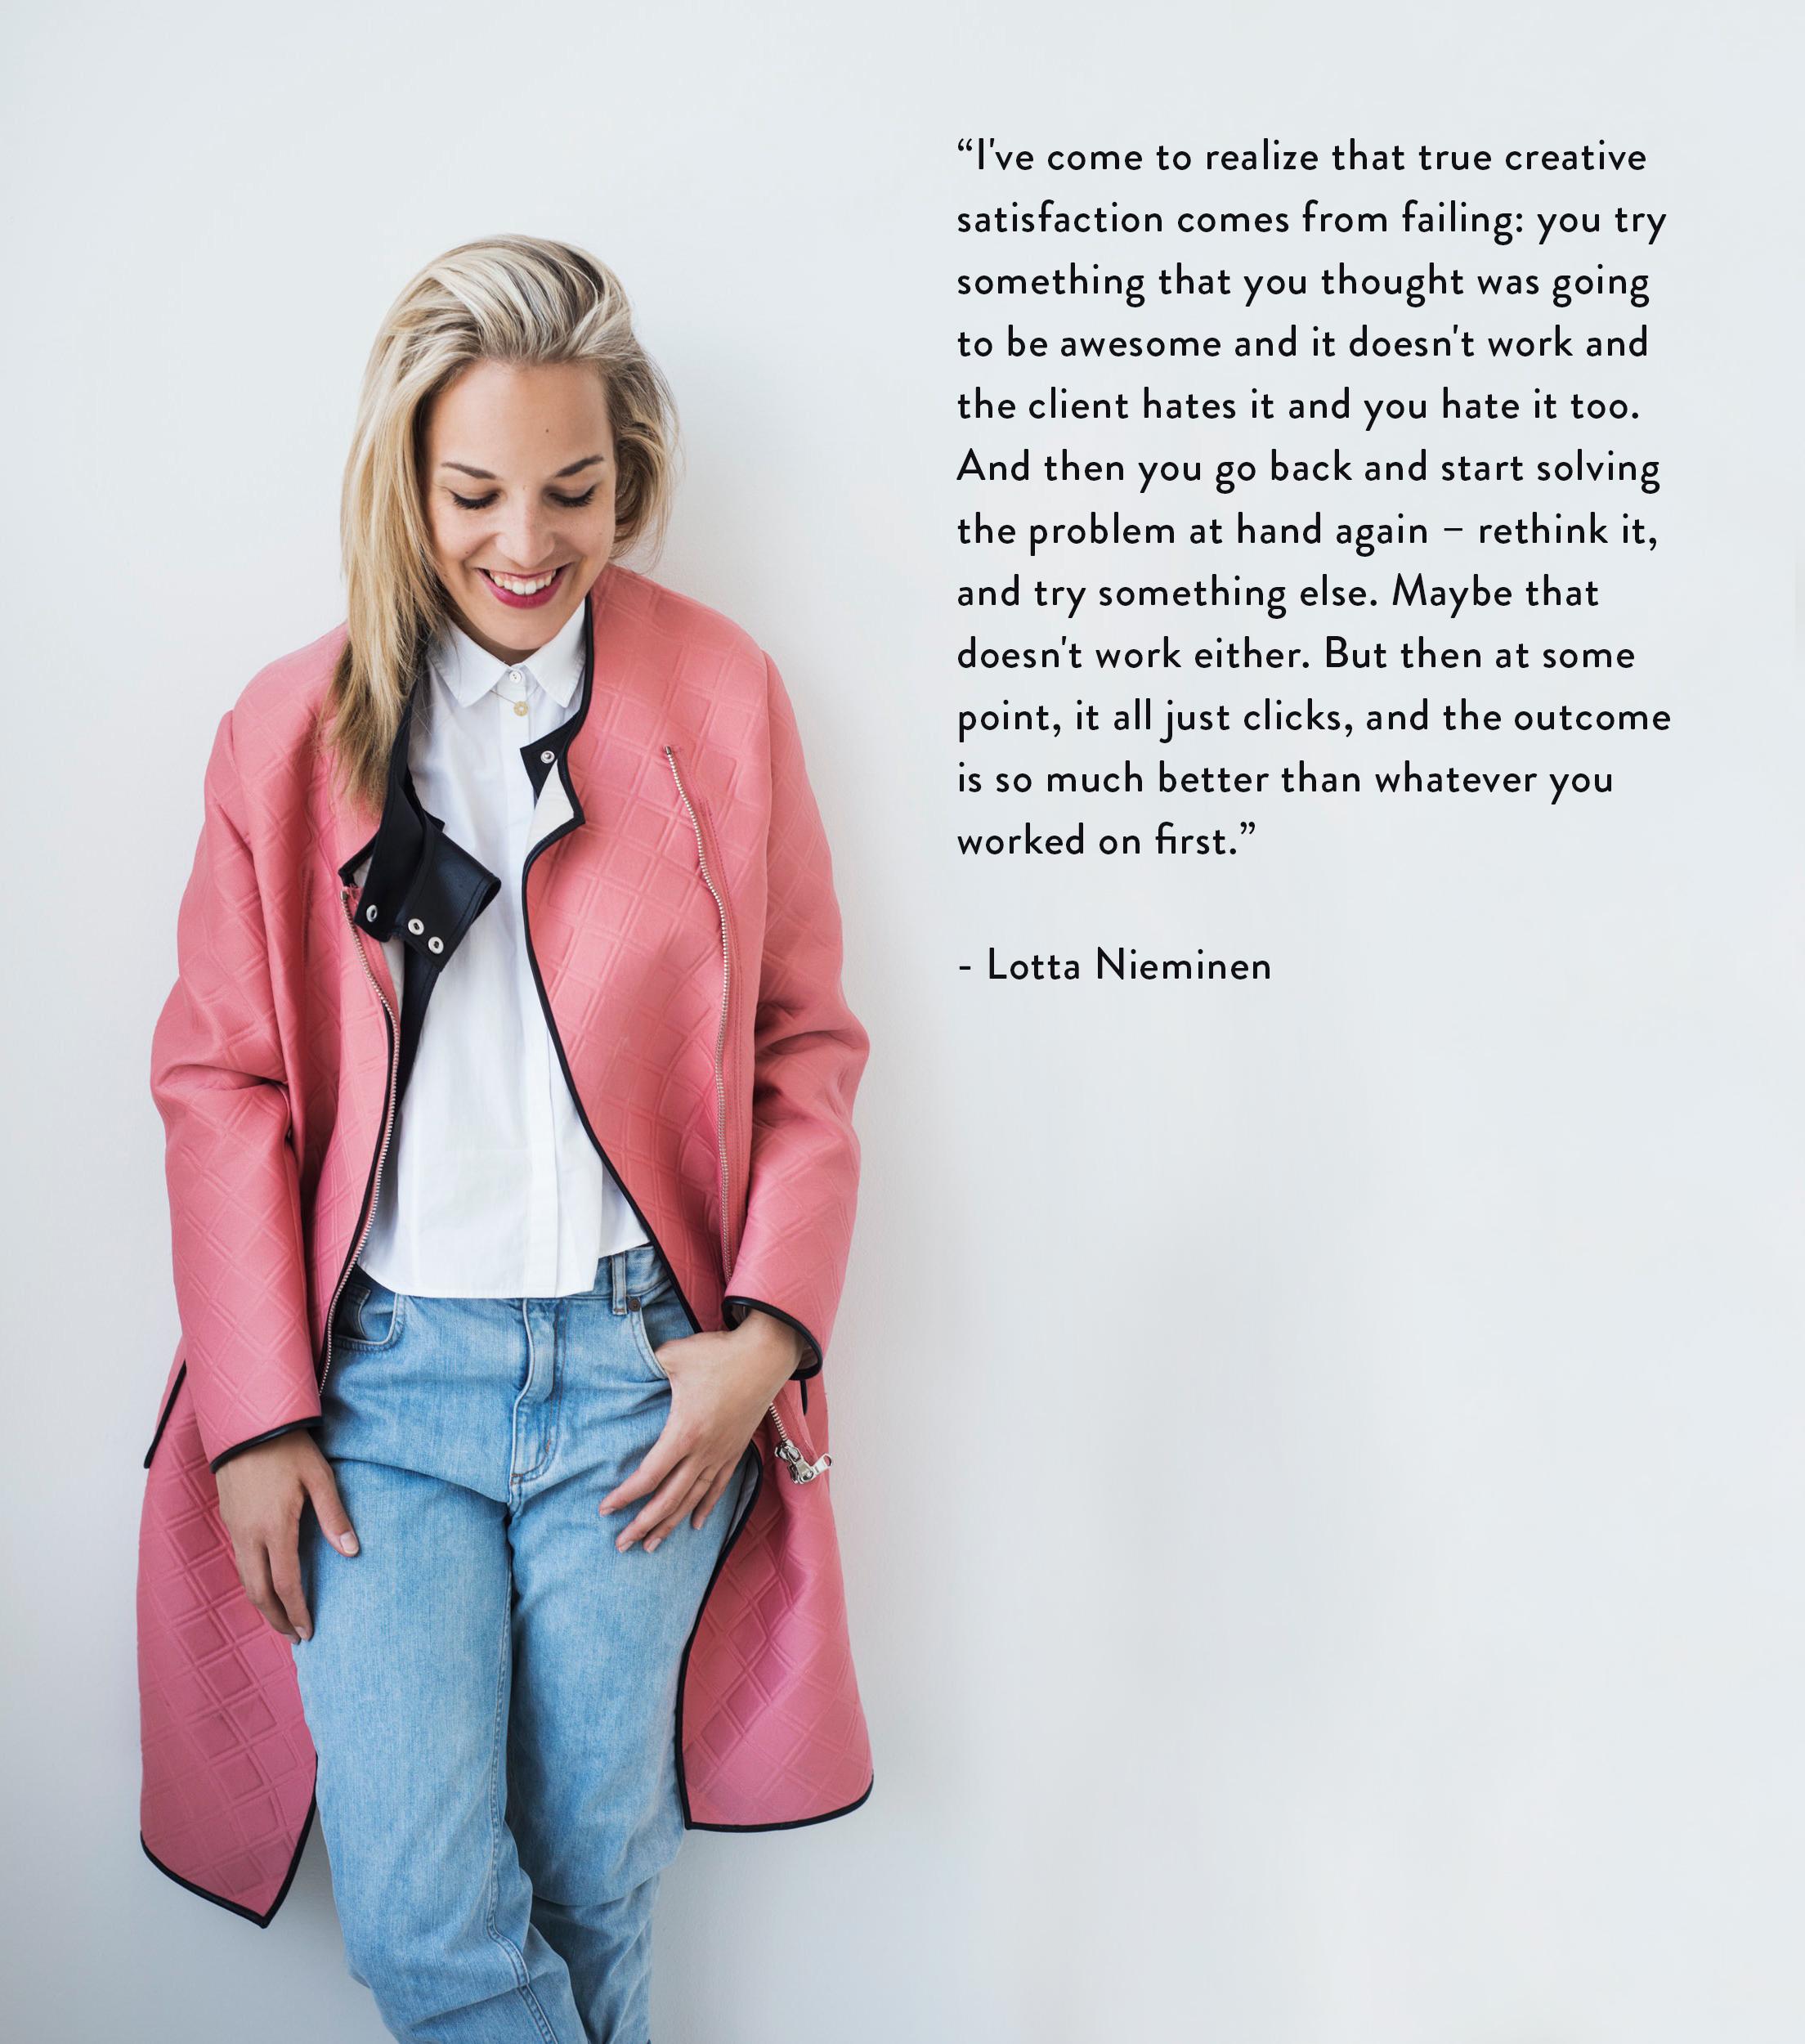 Image credit: for Gloria magazine by Elina Simonen